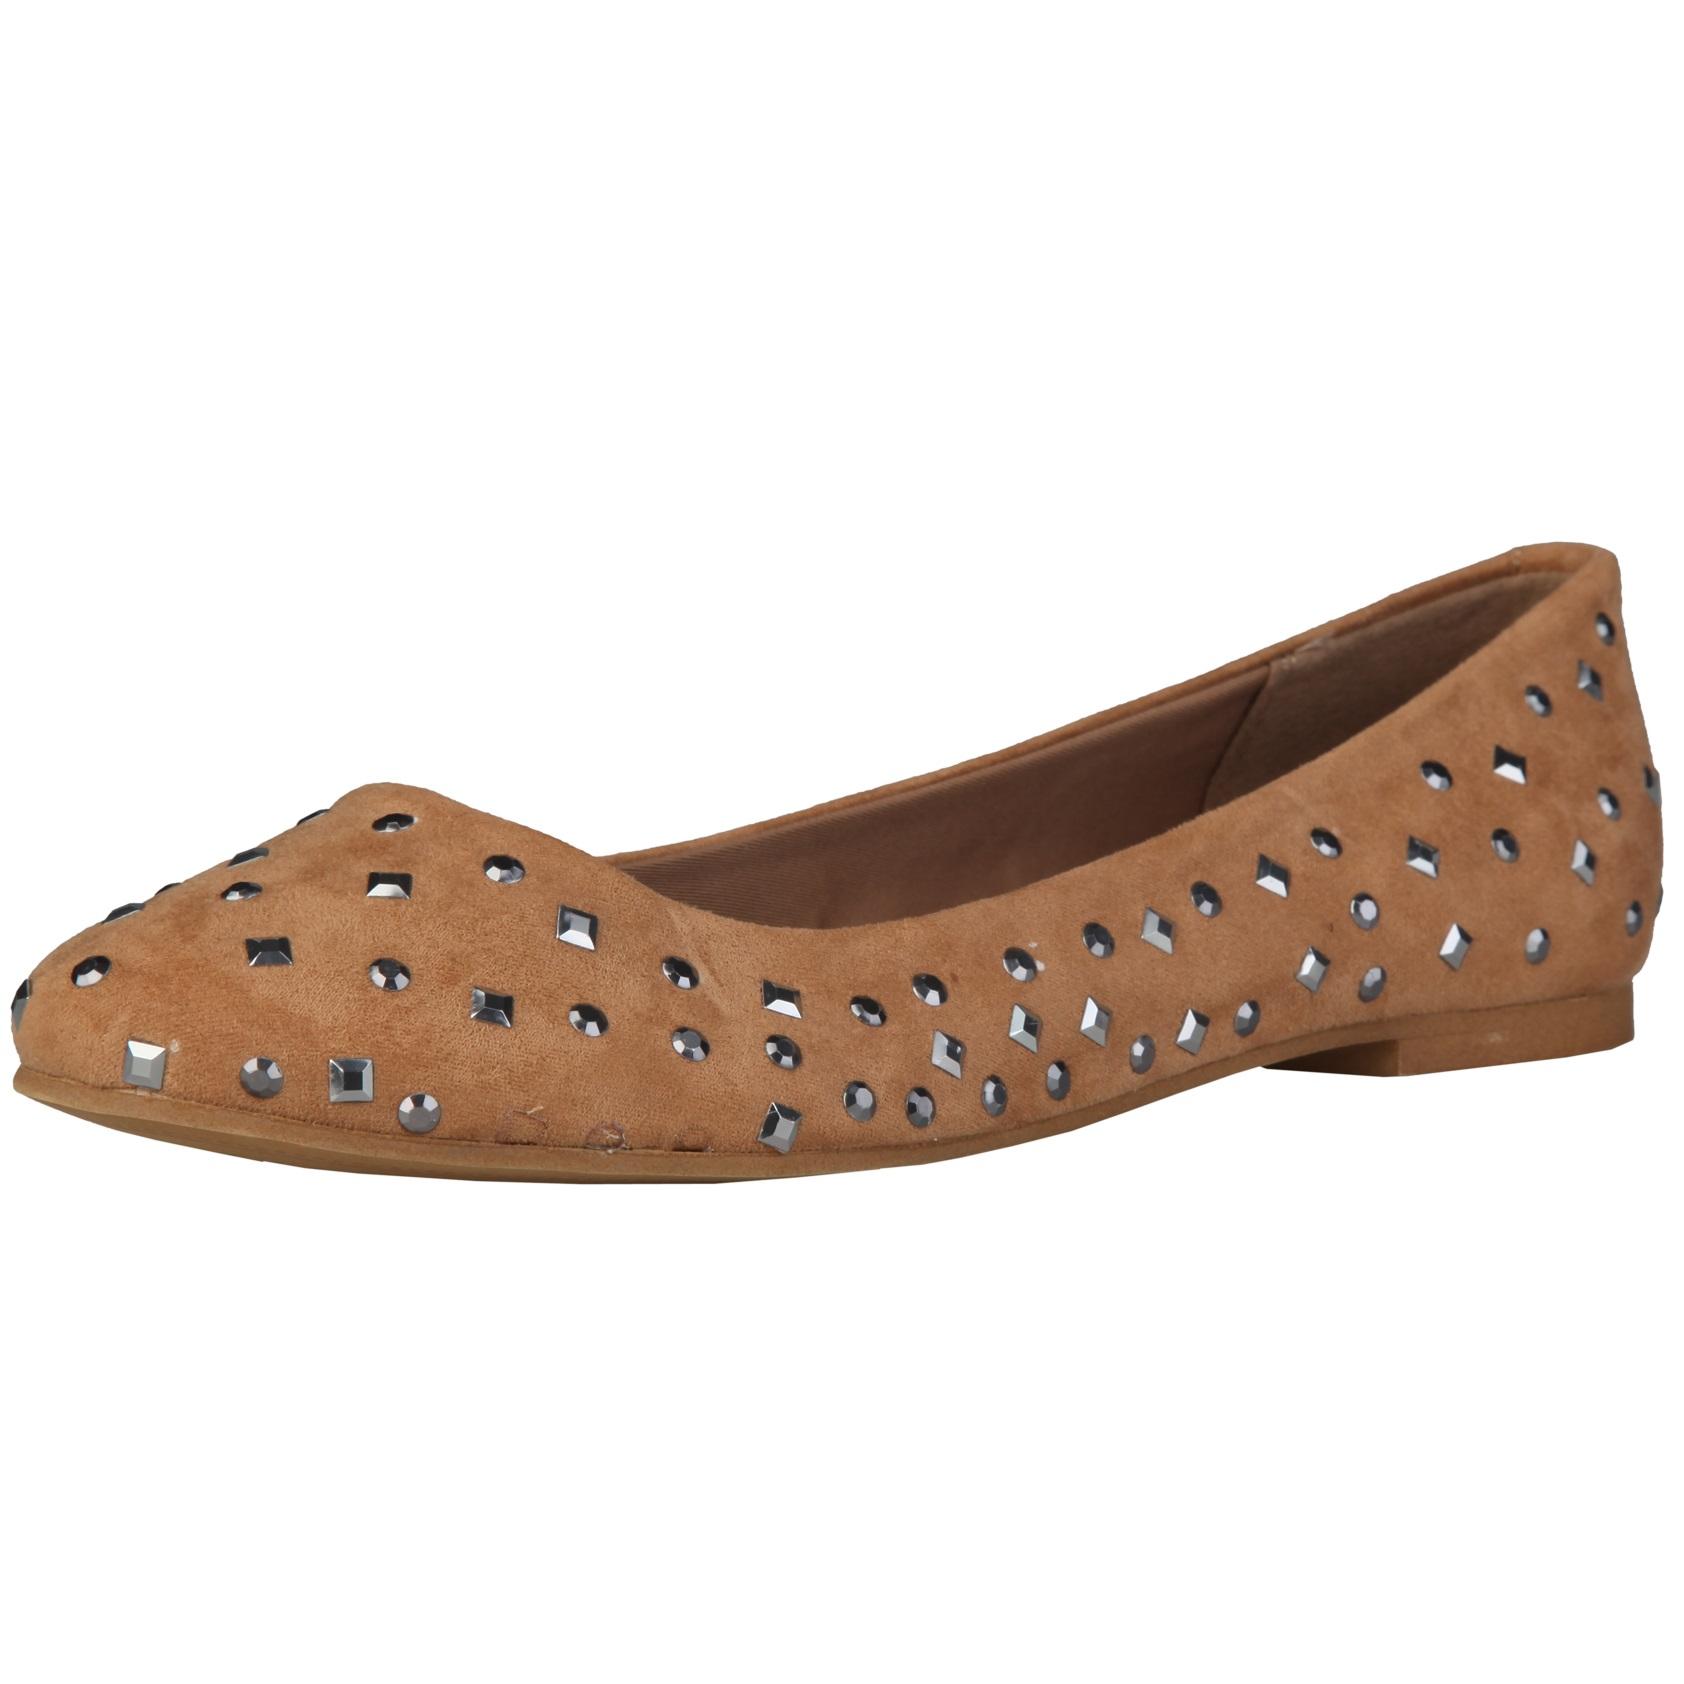 Sofia Loes Flat Shoes Cuoio Rf600151